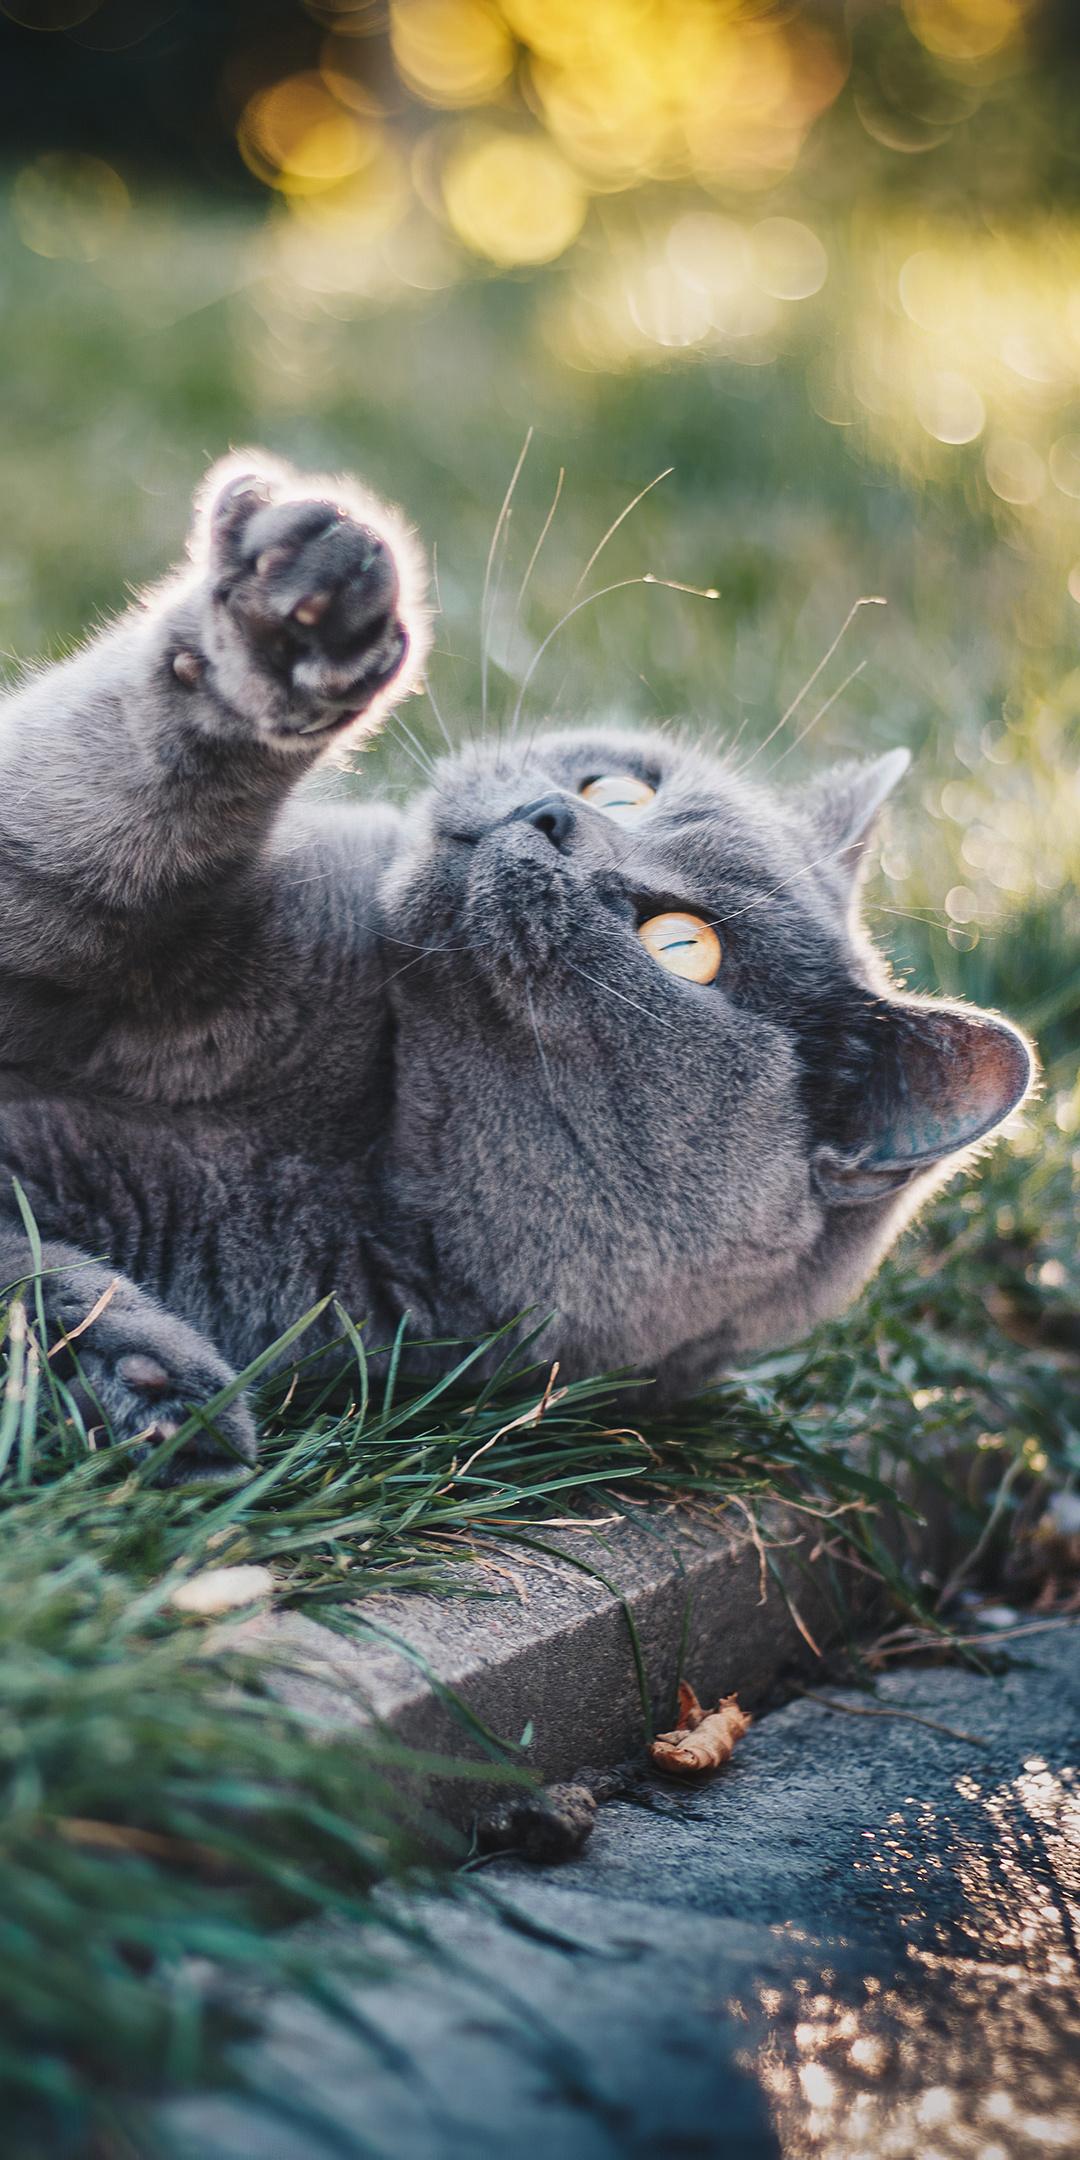 gray-cat-in-grass-4k-mc.jpg